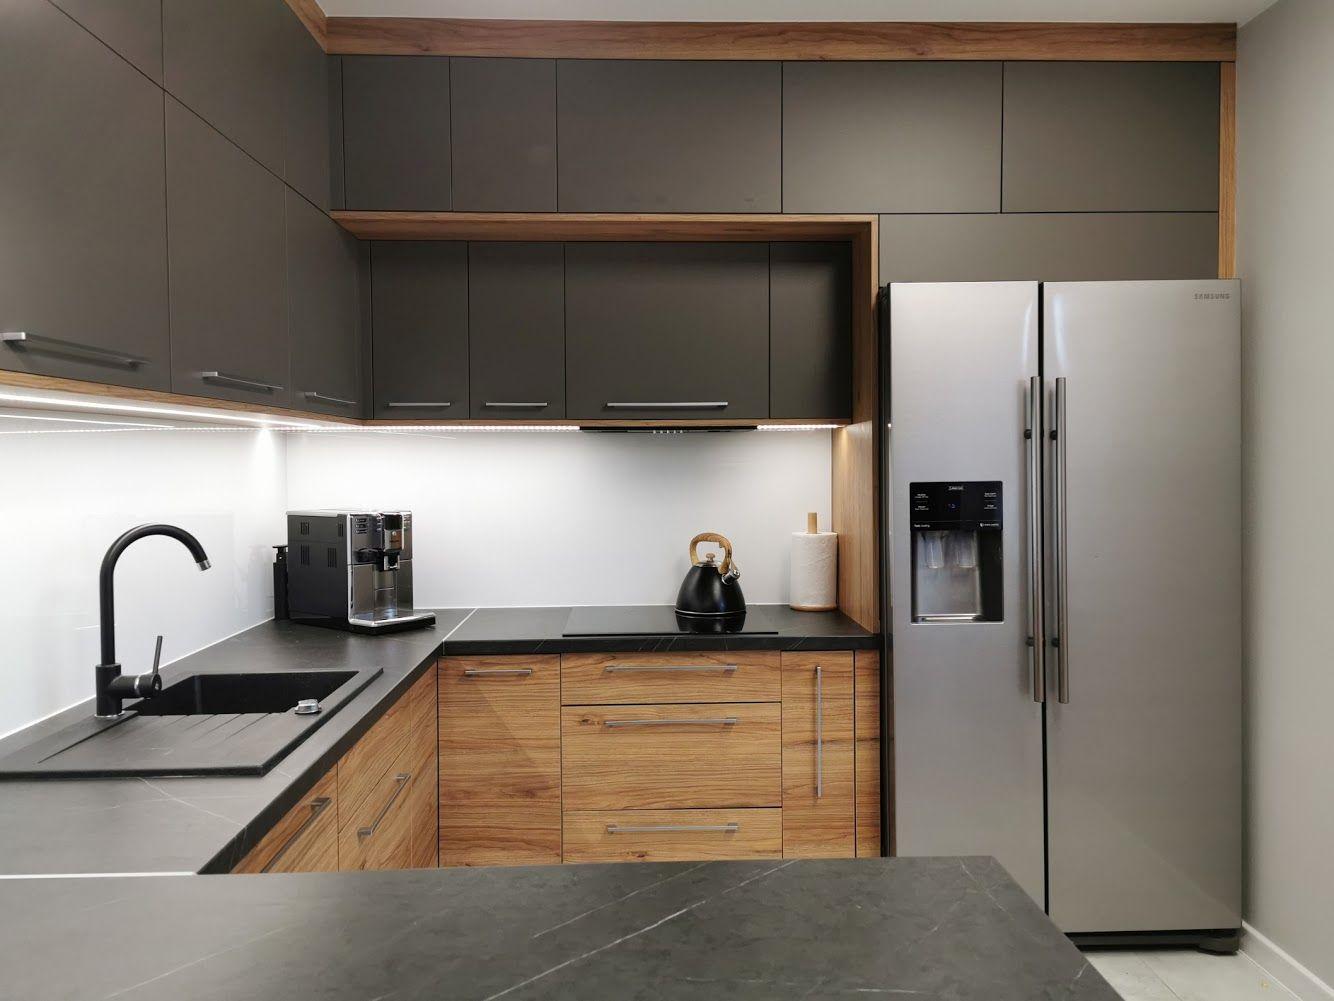 Szare Meble Kuchenne Kitchen Cabinets Decor Home Decor